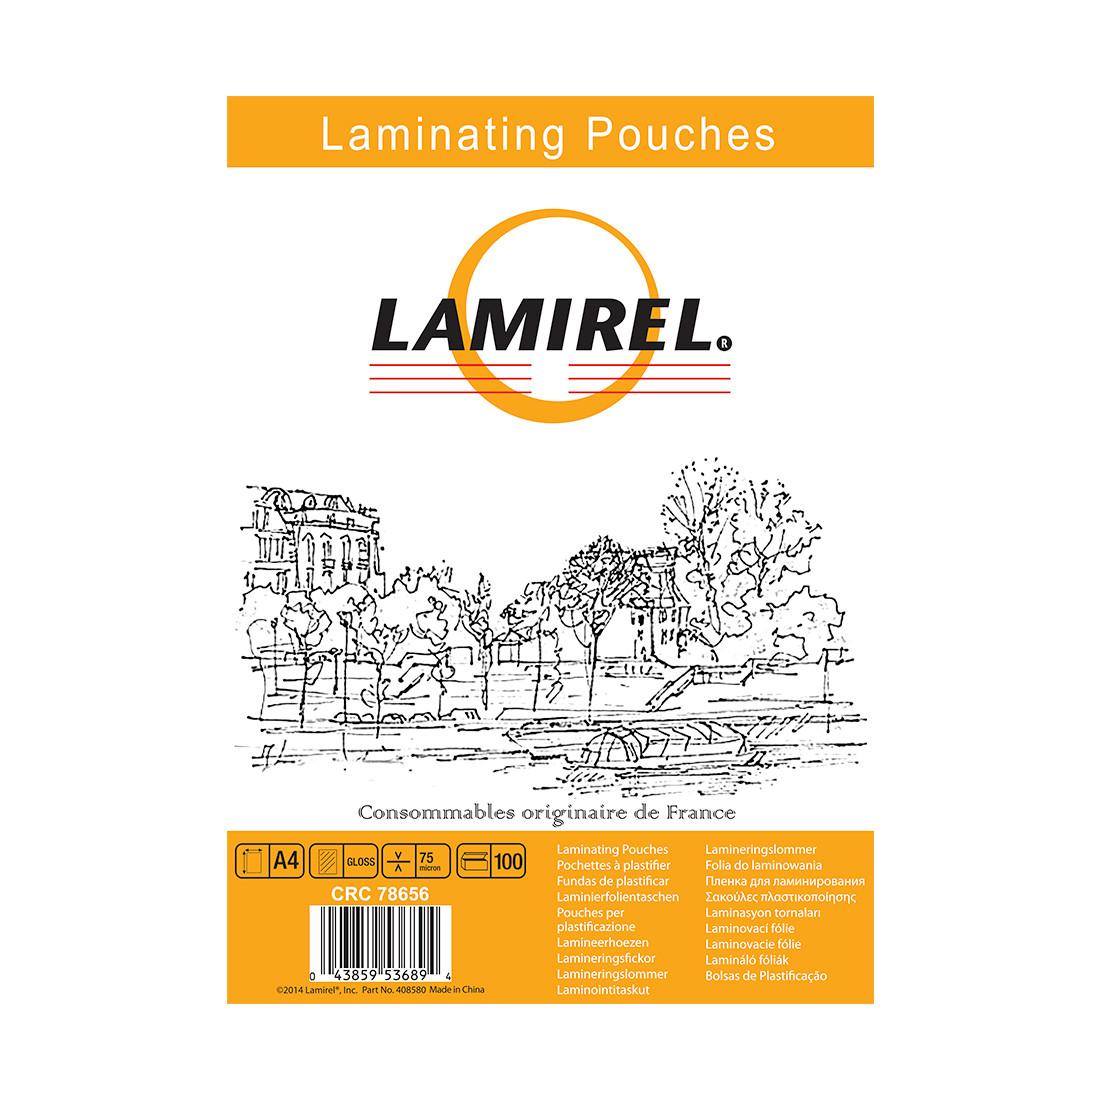 Пленка для ламинирования, Lamirel, LA-78656, А4, 75мкм, 100 шт.